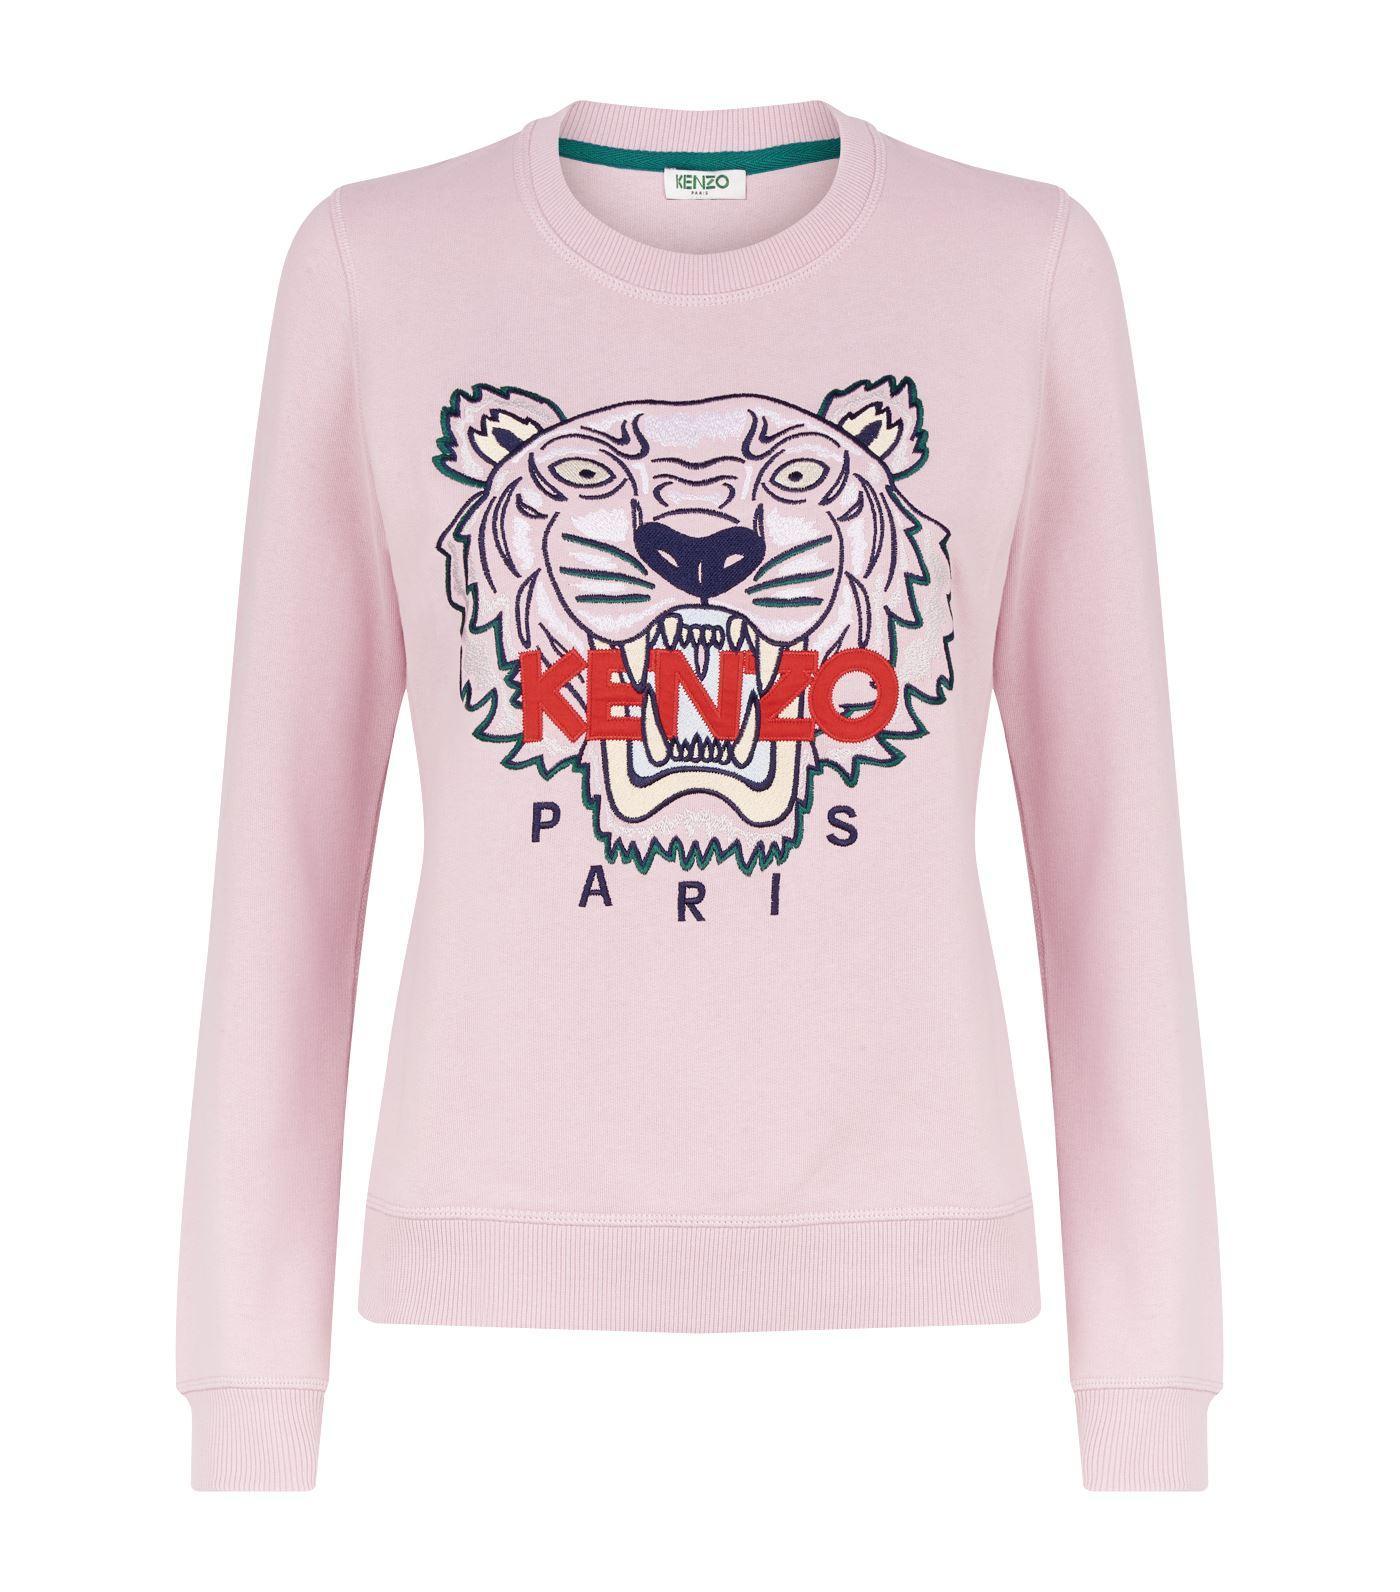 6c7310c0f3b KENZO - Pink Icon Tiger Sweatshirt - Lyst. View fullscreen